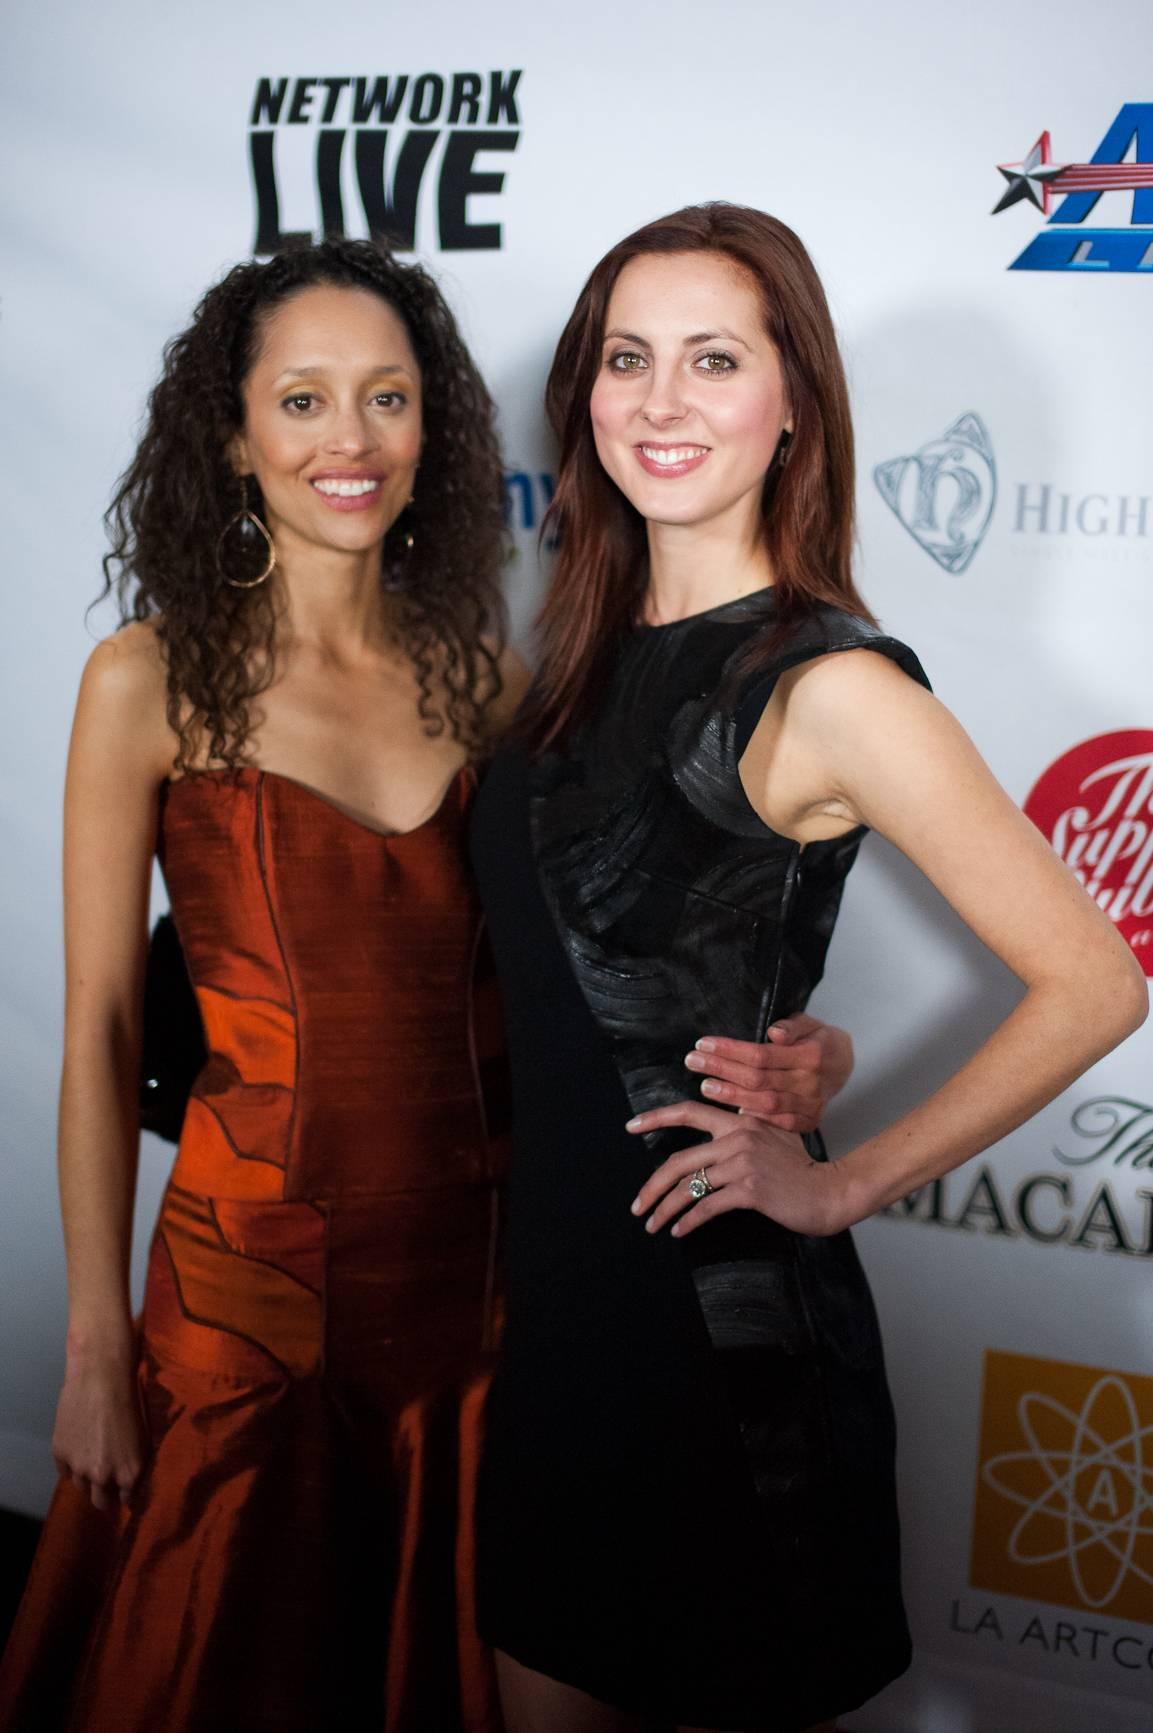 Event Producer Gloria Huwiler (Left), Eva Amurri Martino (Right)